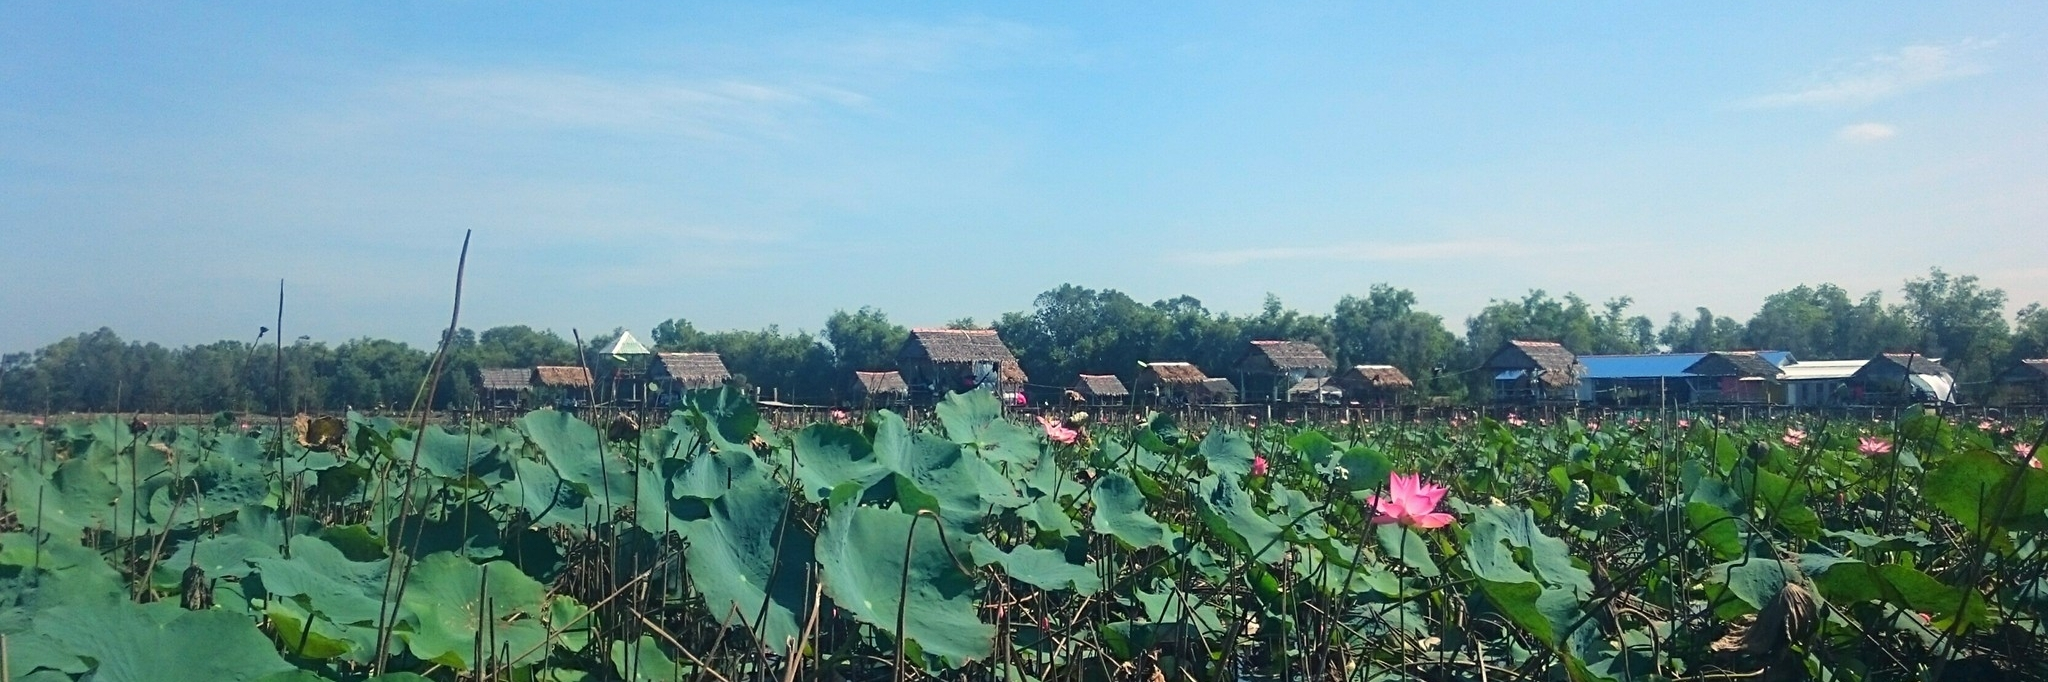 https://gody.vn/blog/trhgvhung.fa1924/post/vietnamsolo-thap-muoi-bat-ngat-sen-hong-967